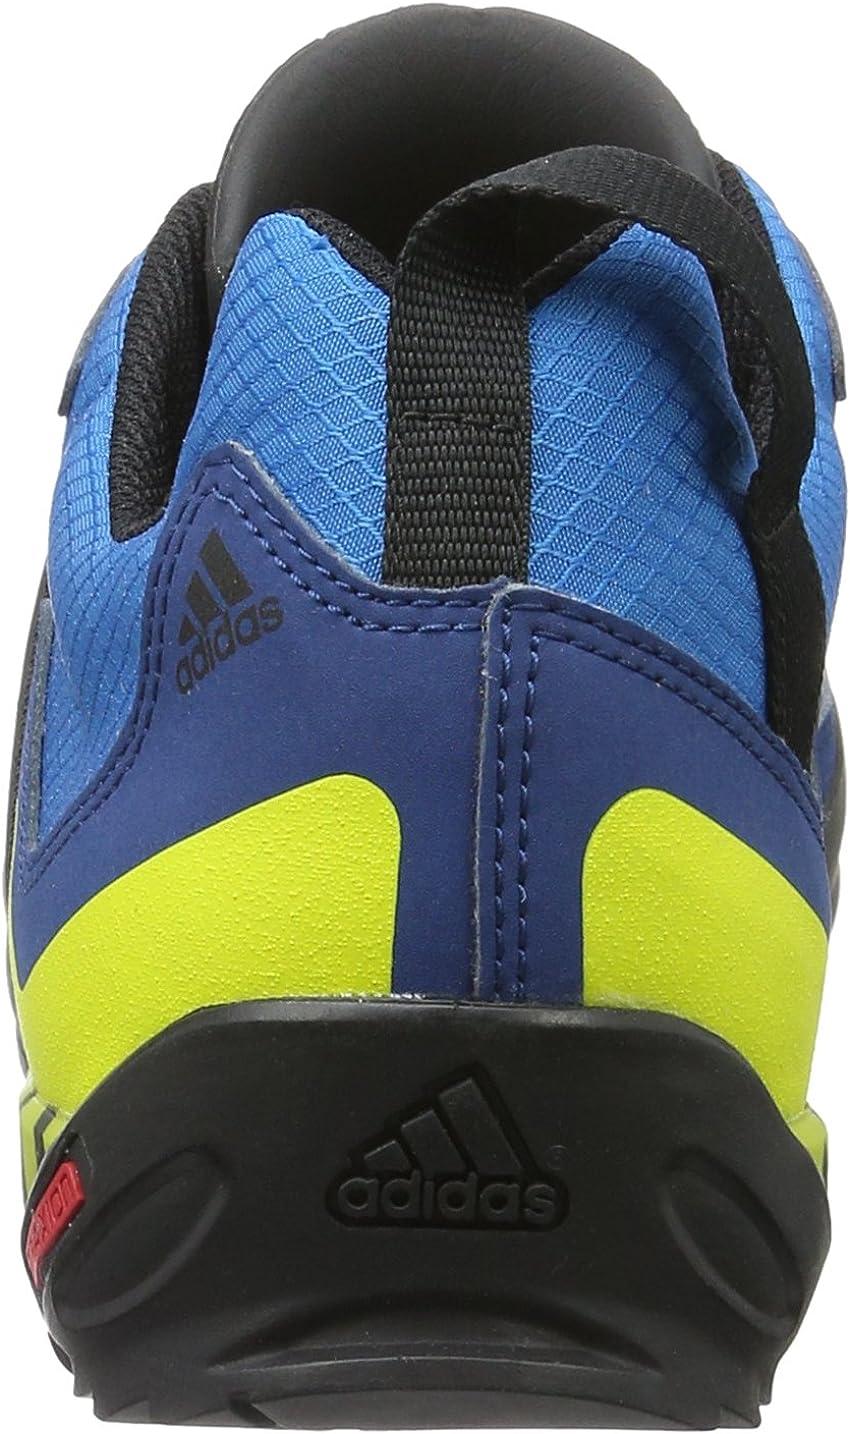 adidas Terrex Swift Solo, Chaussures de randonnée Mixte Adulte Multicolore Azul Azuuni Negbas Limuni